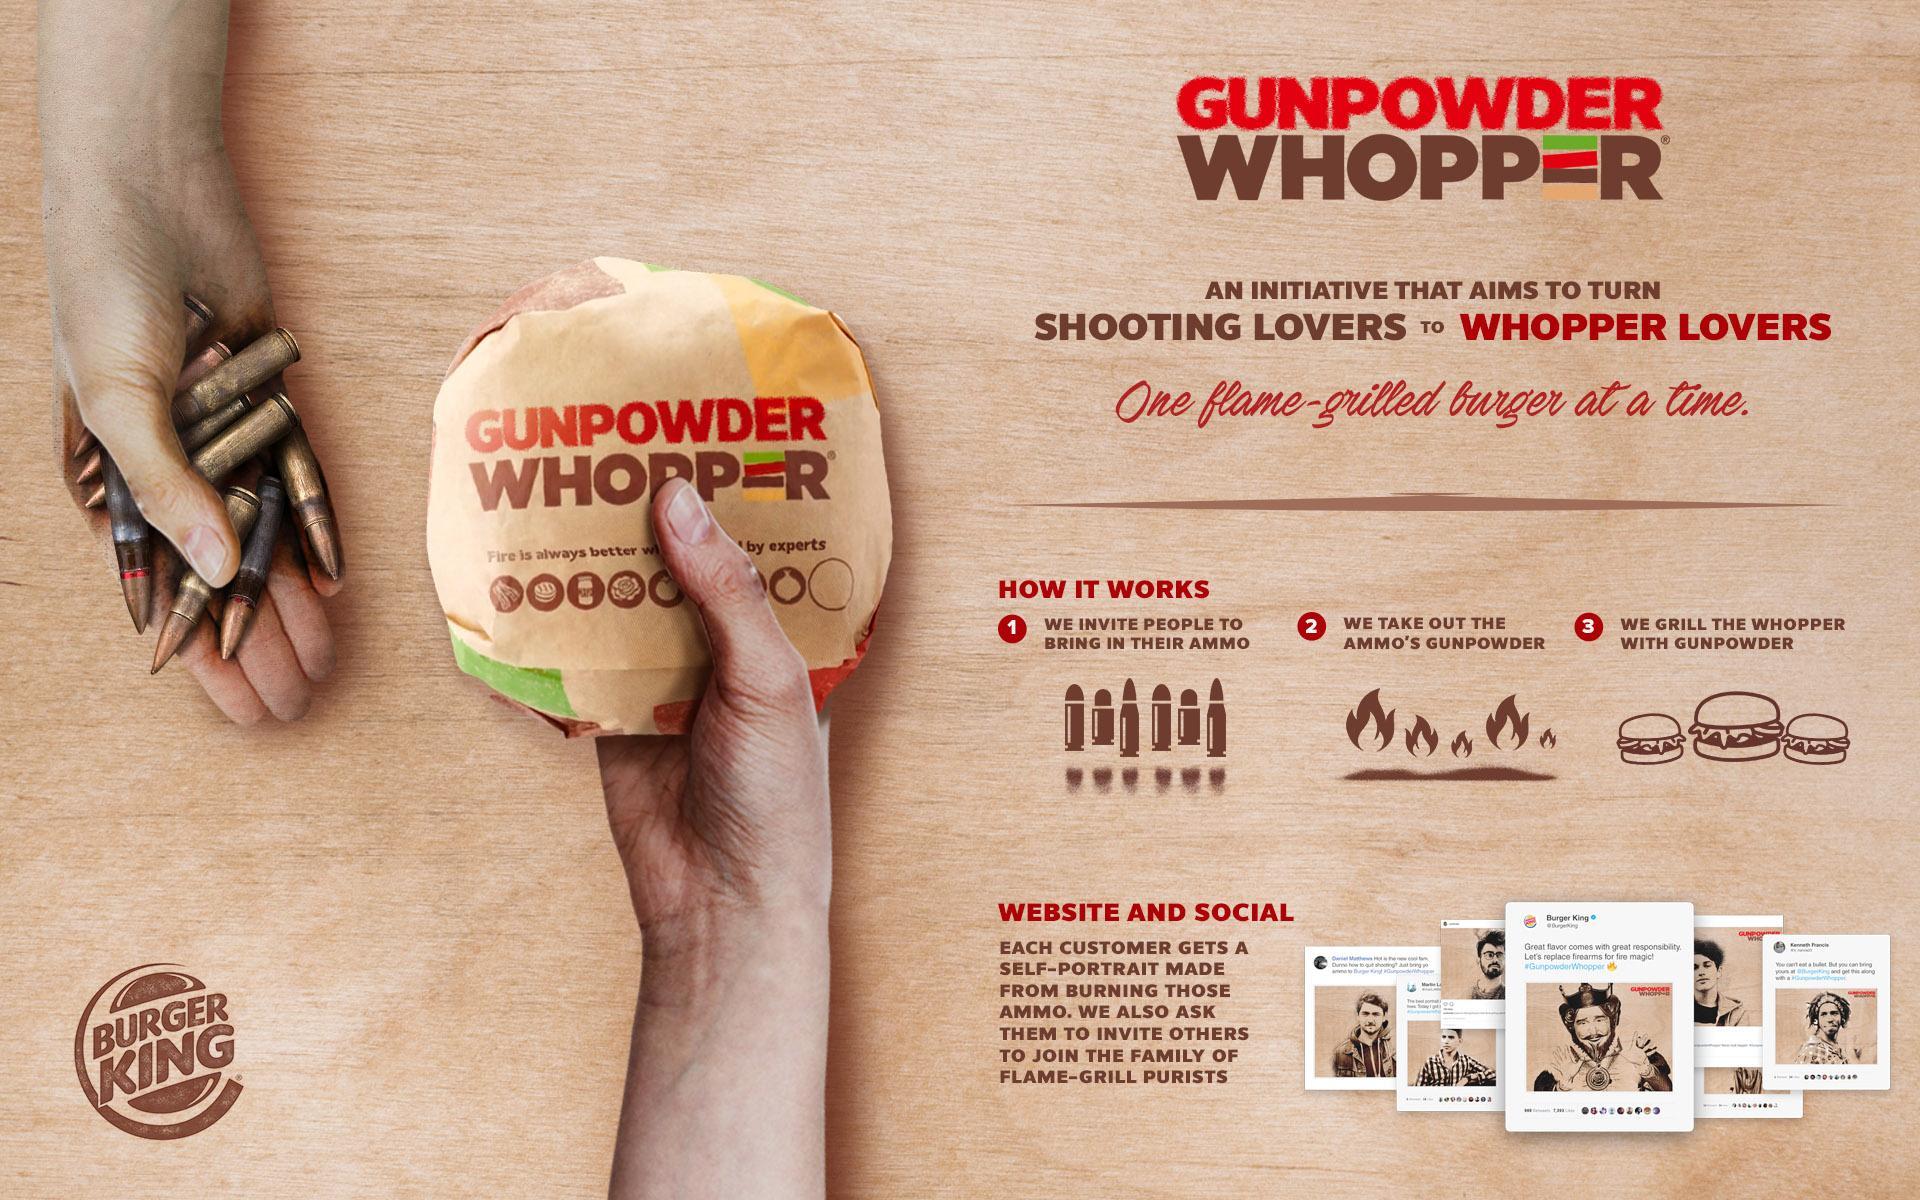 Burger King Film Ad - Gunpowder Whopper